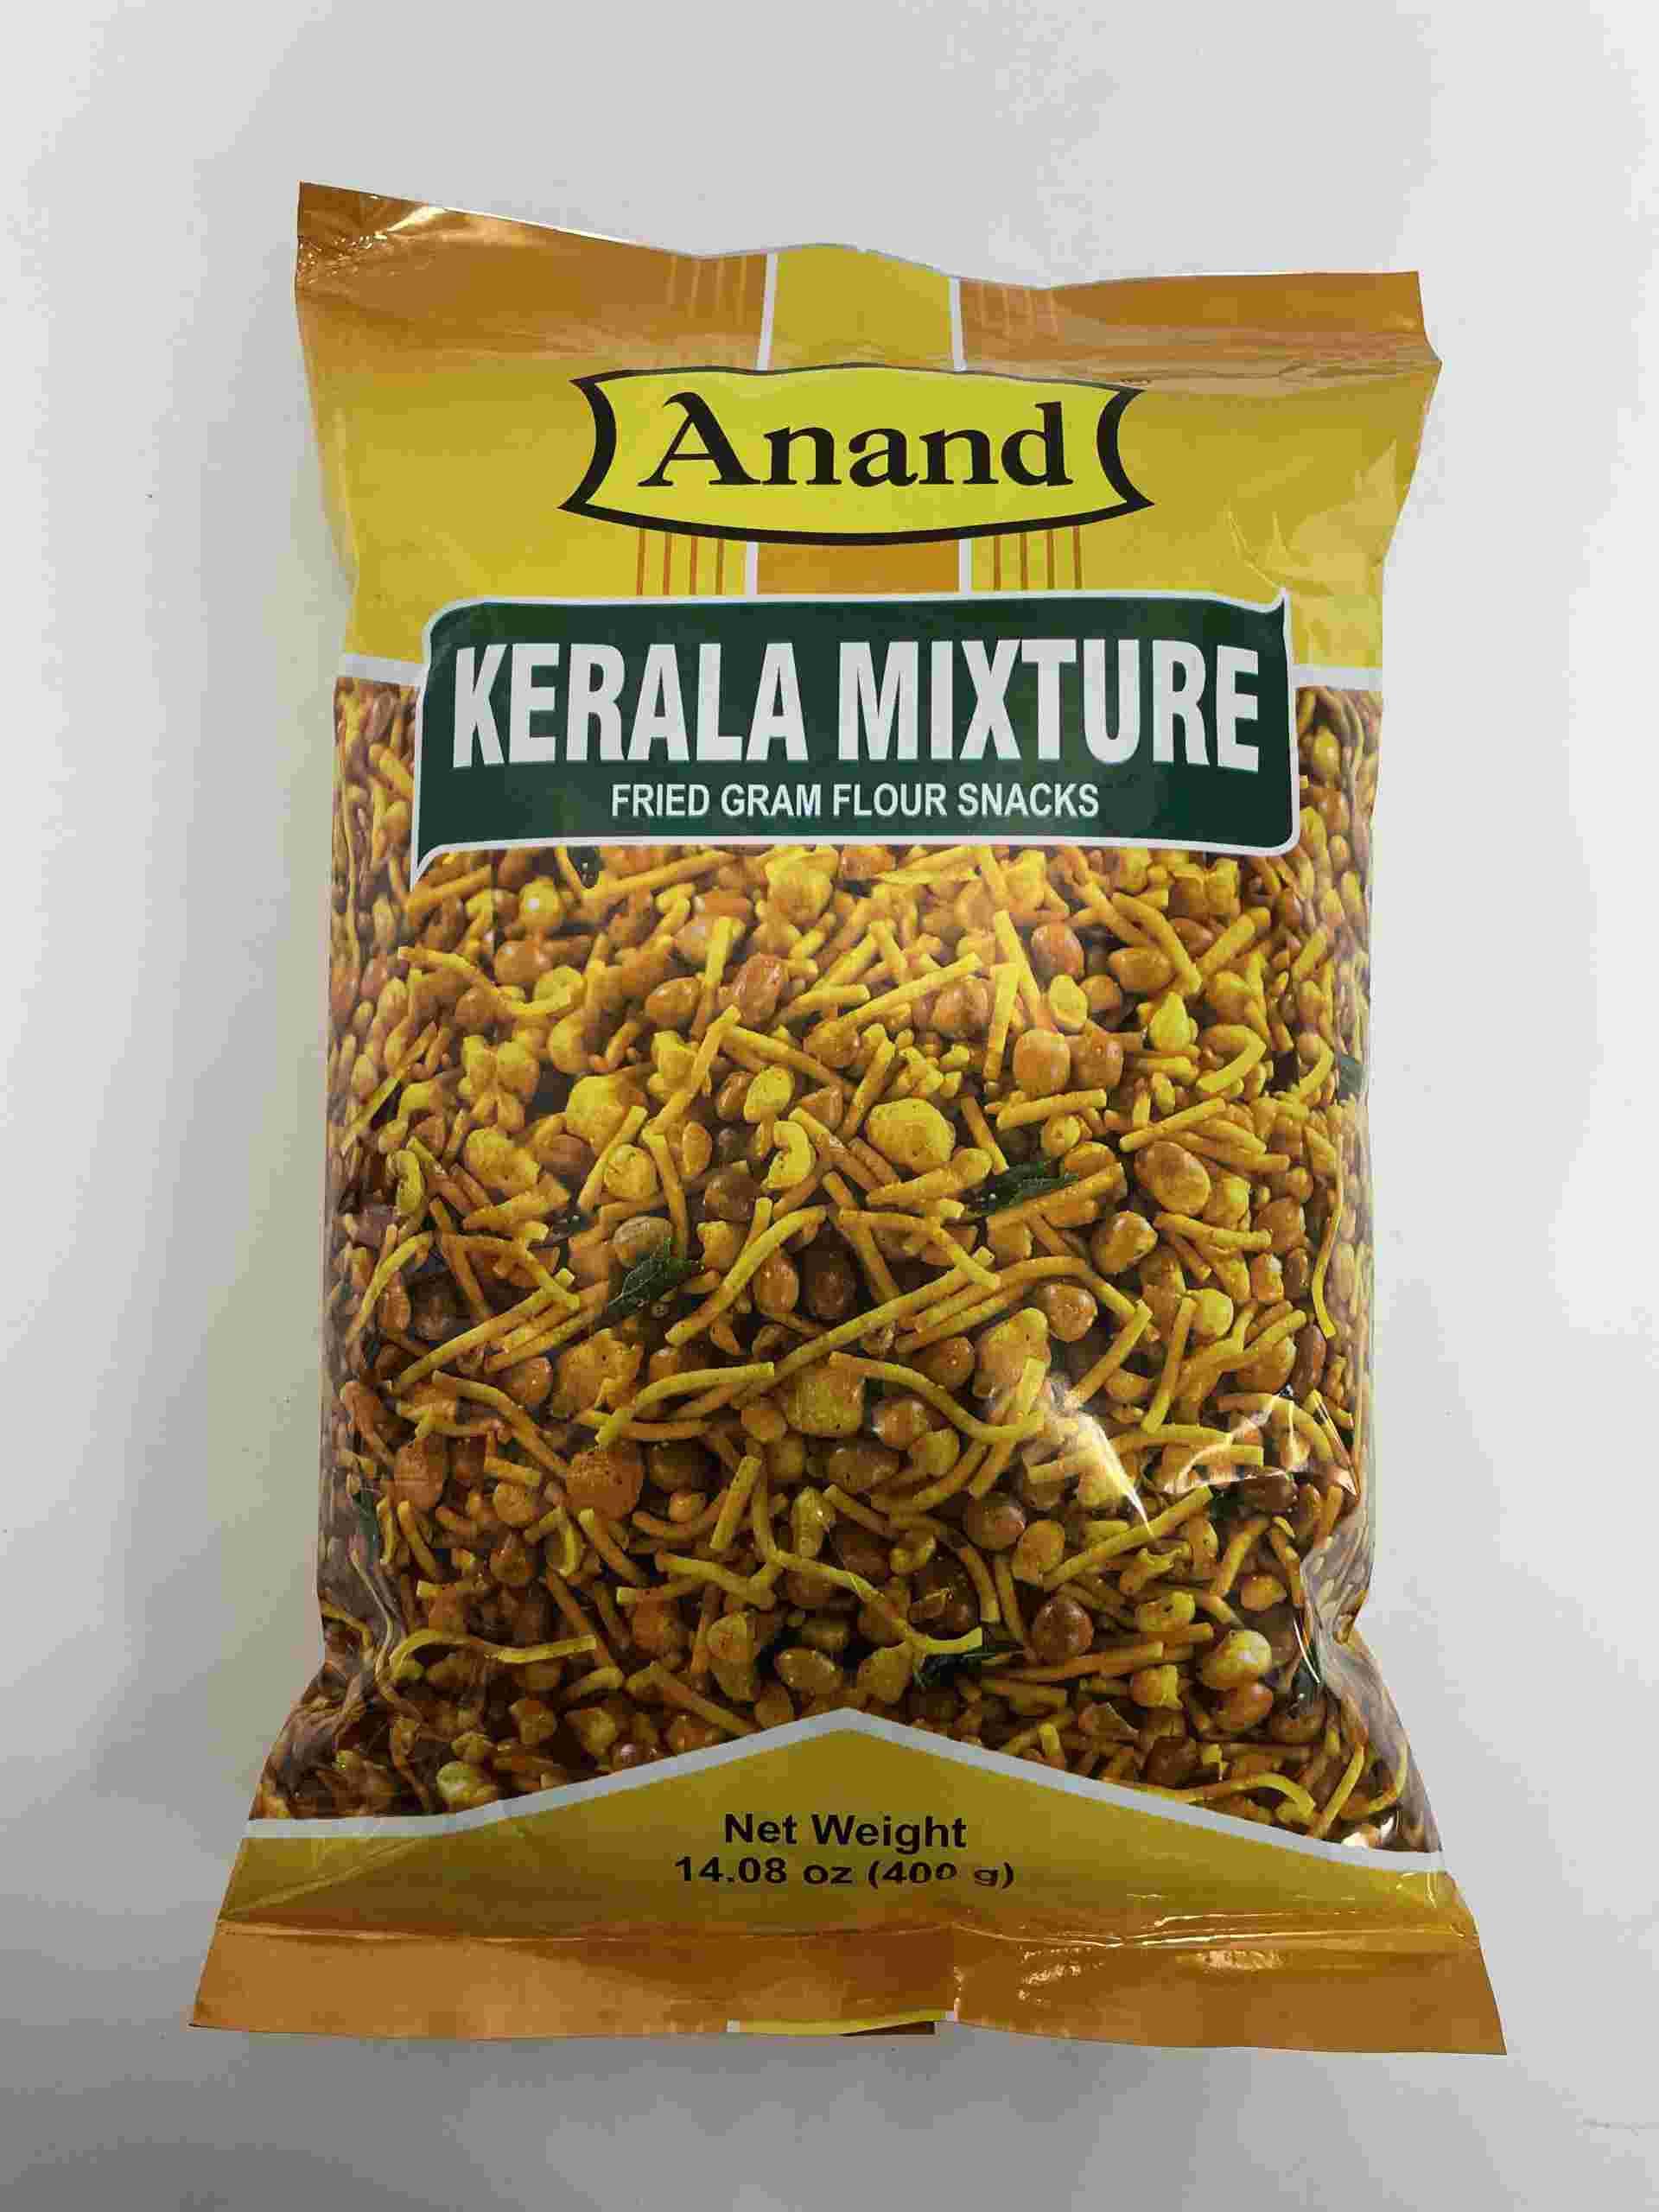 Anand Kerala Mixture (Fried Gram Flour Snacks